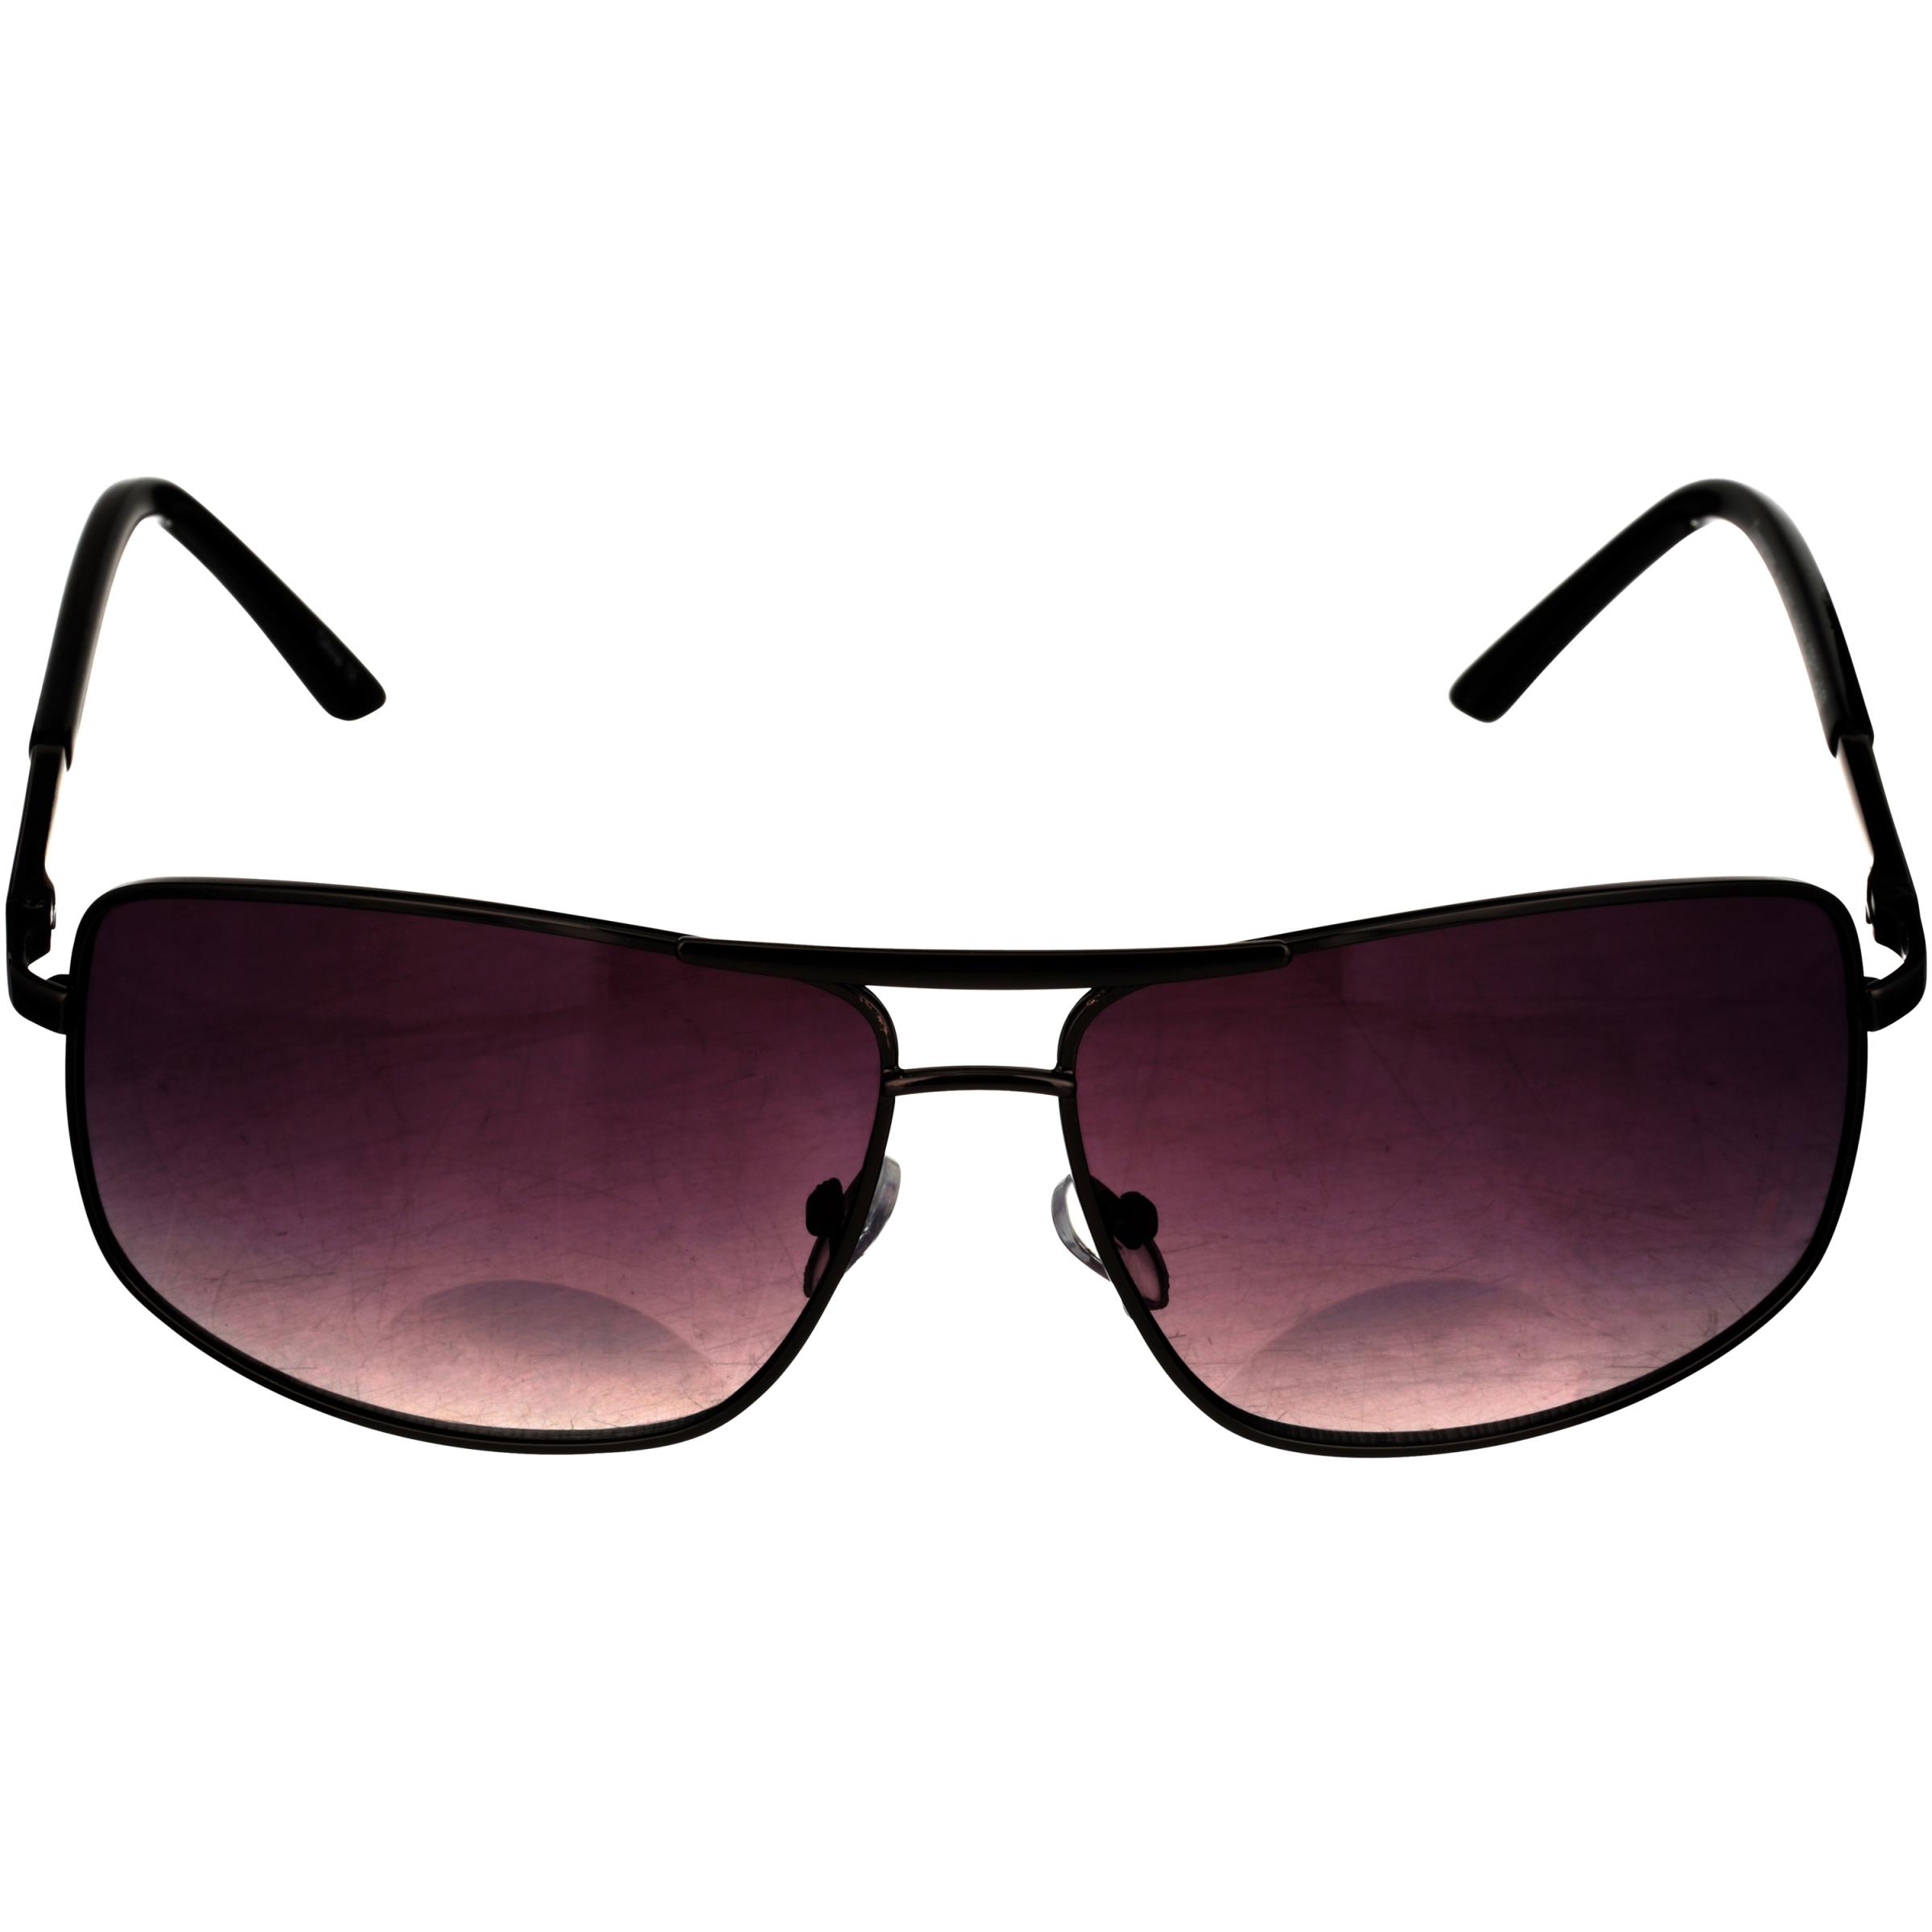 Coppertone®  Sunglass Readers® 1 pr Pack